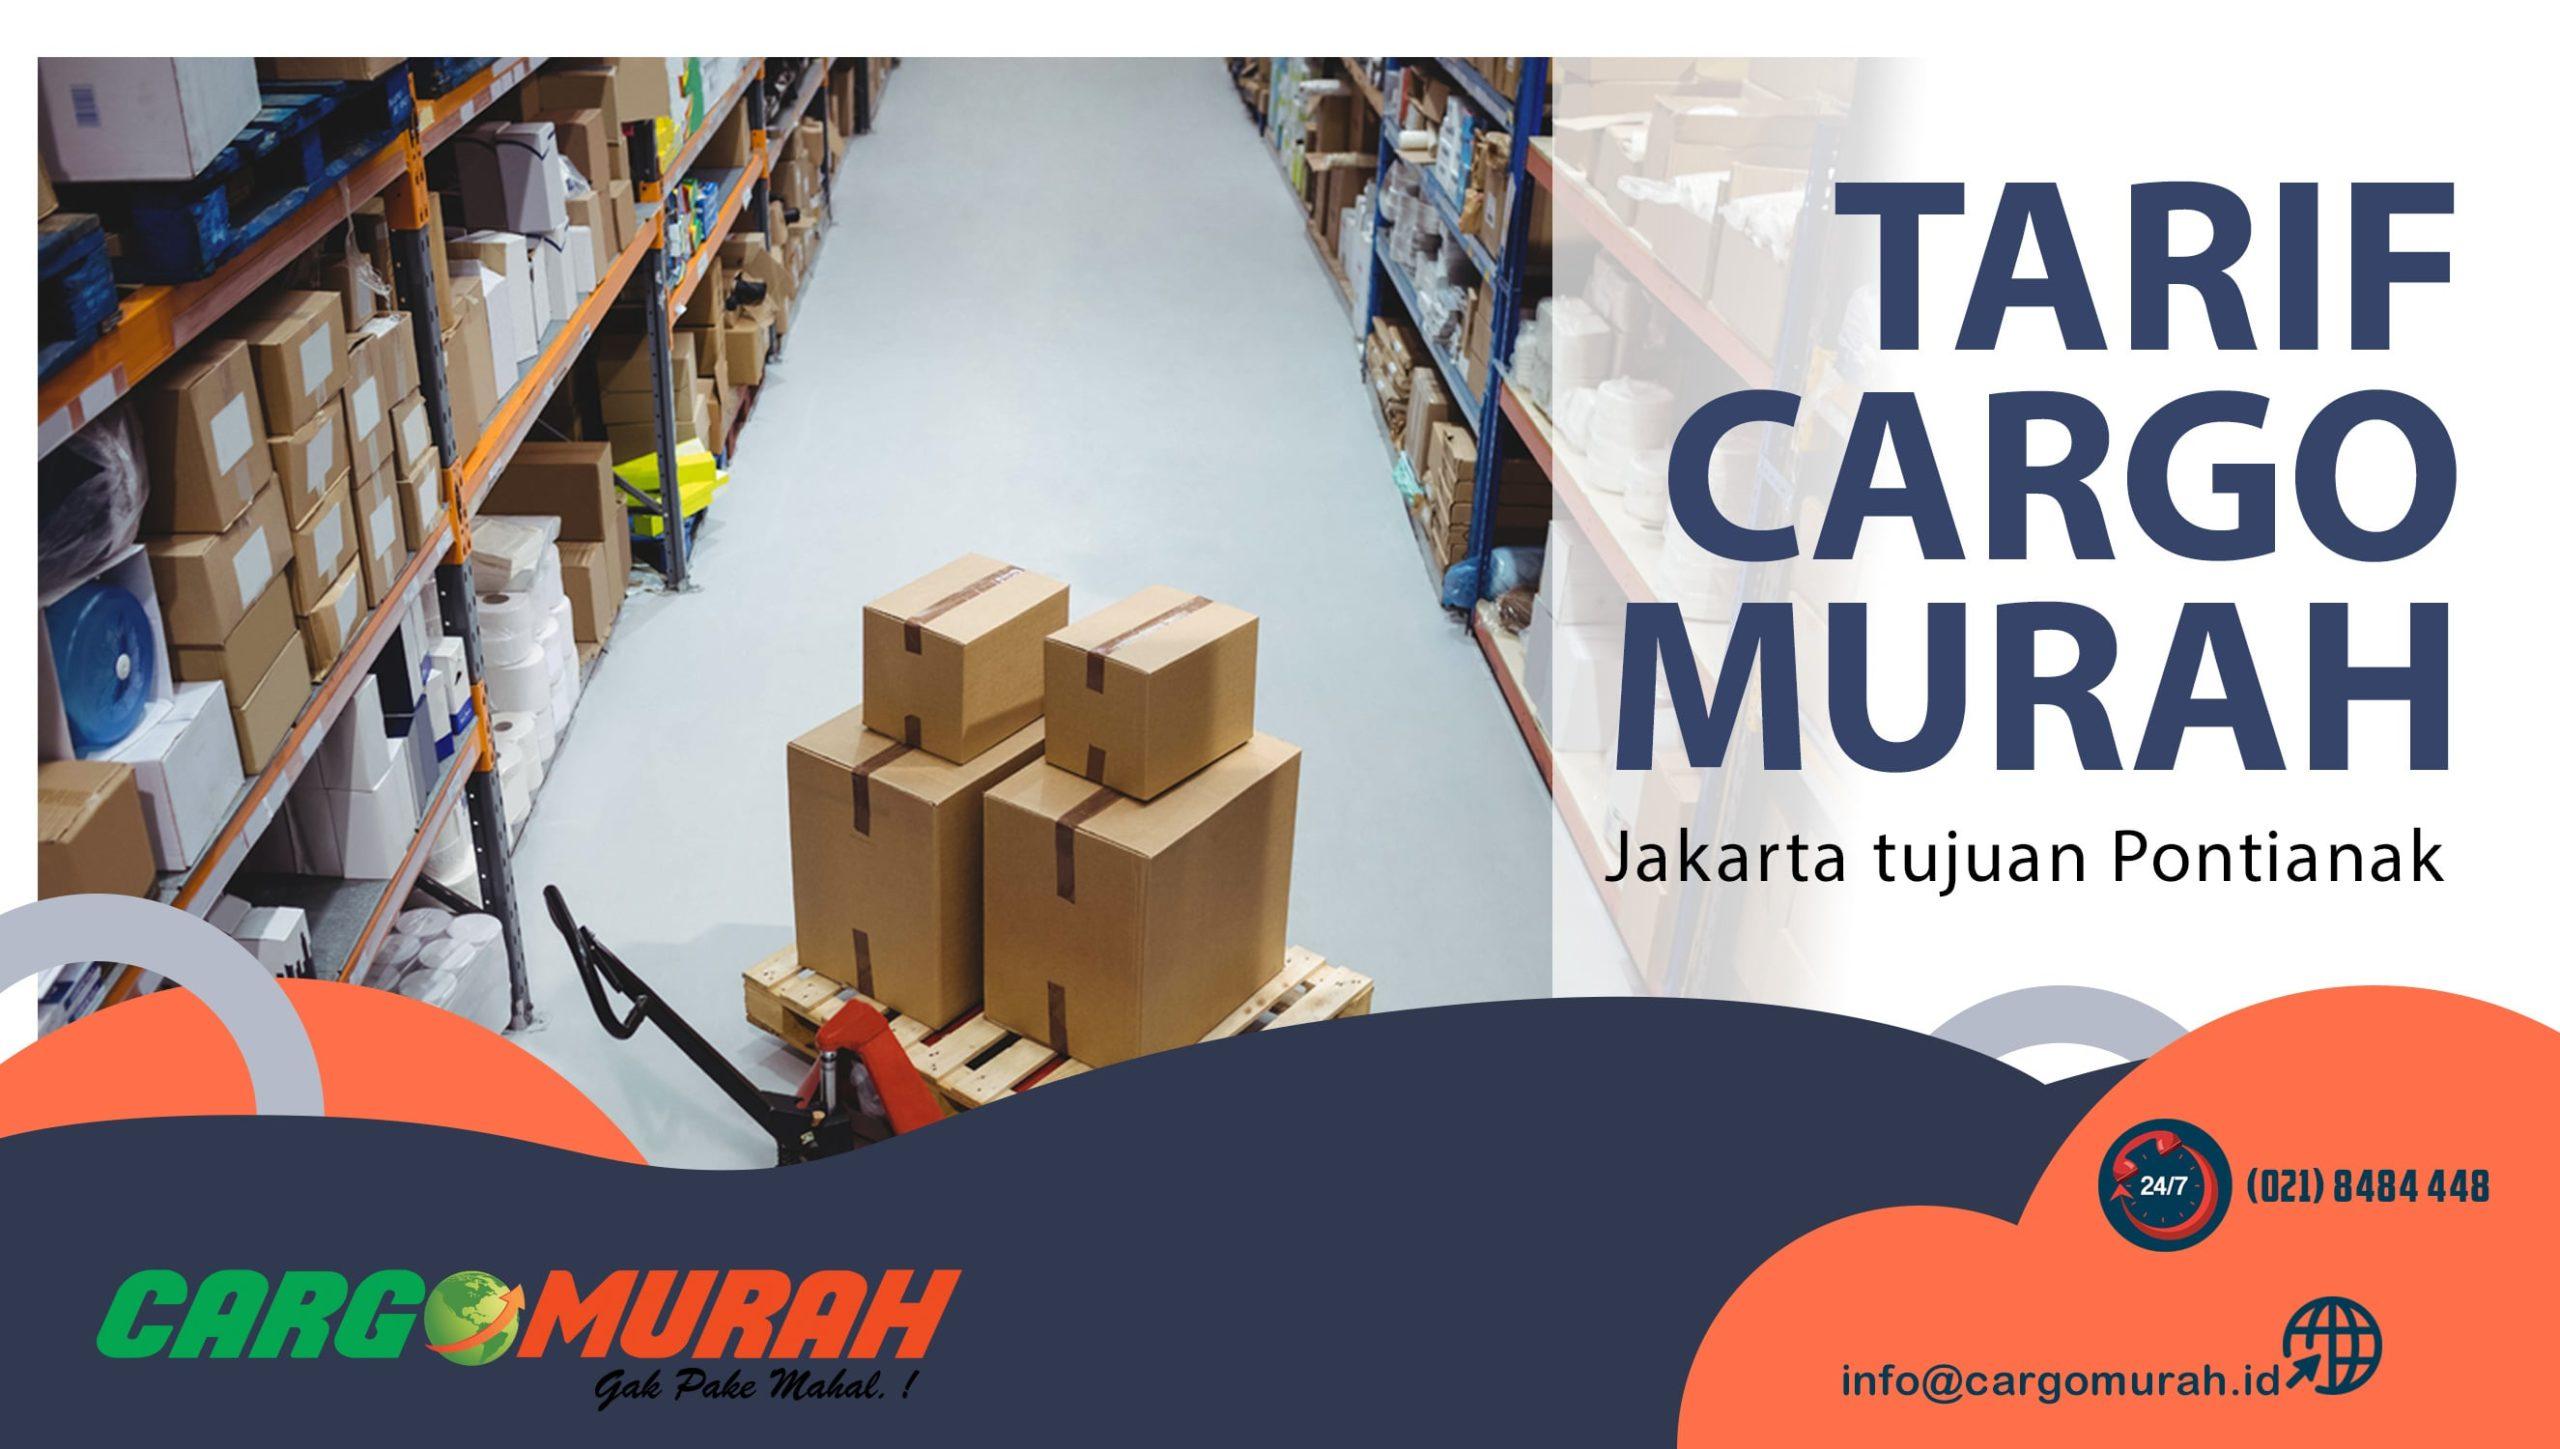 Jasa Pengiriman Barang Cargo Murah Jakarta ke Pontianak